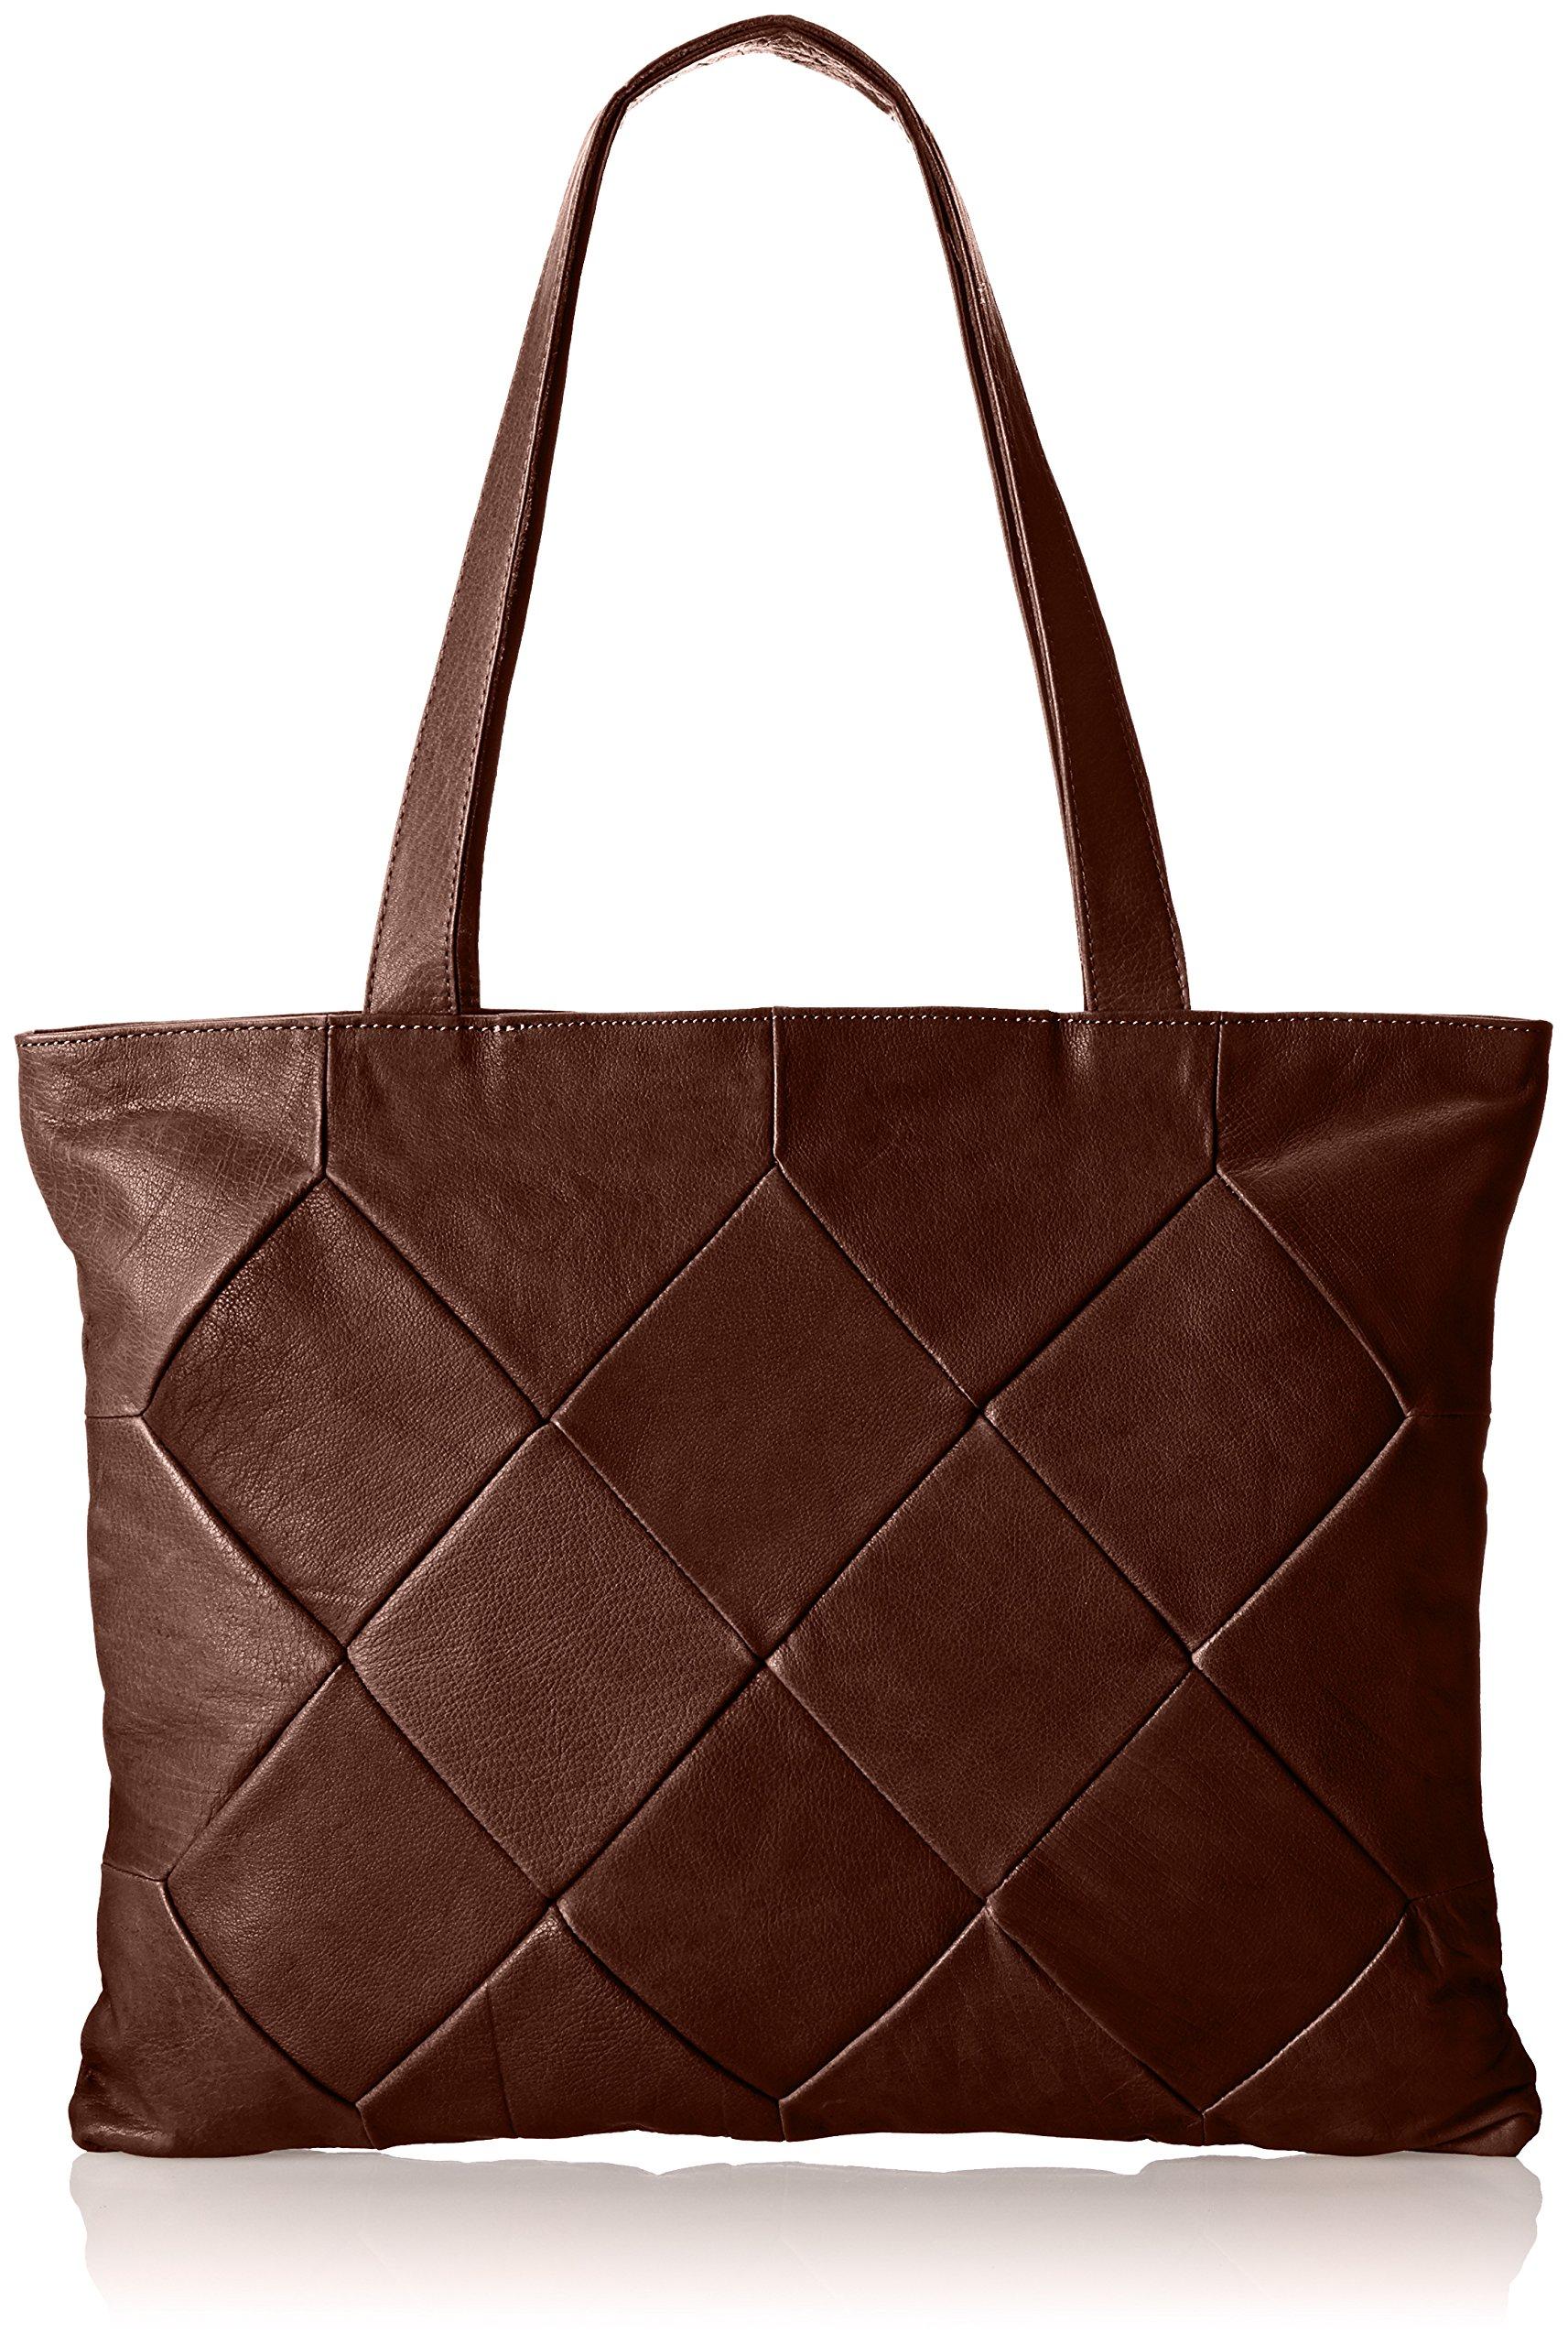 Latico Elizabeth Shoulder Bag, Glove Wine, One Size